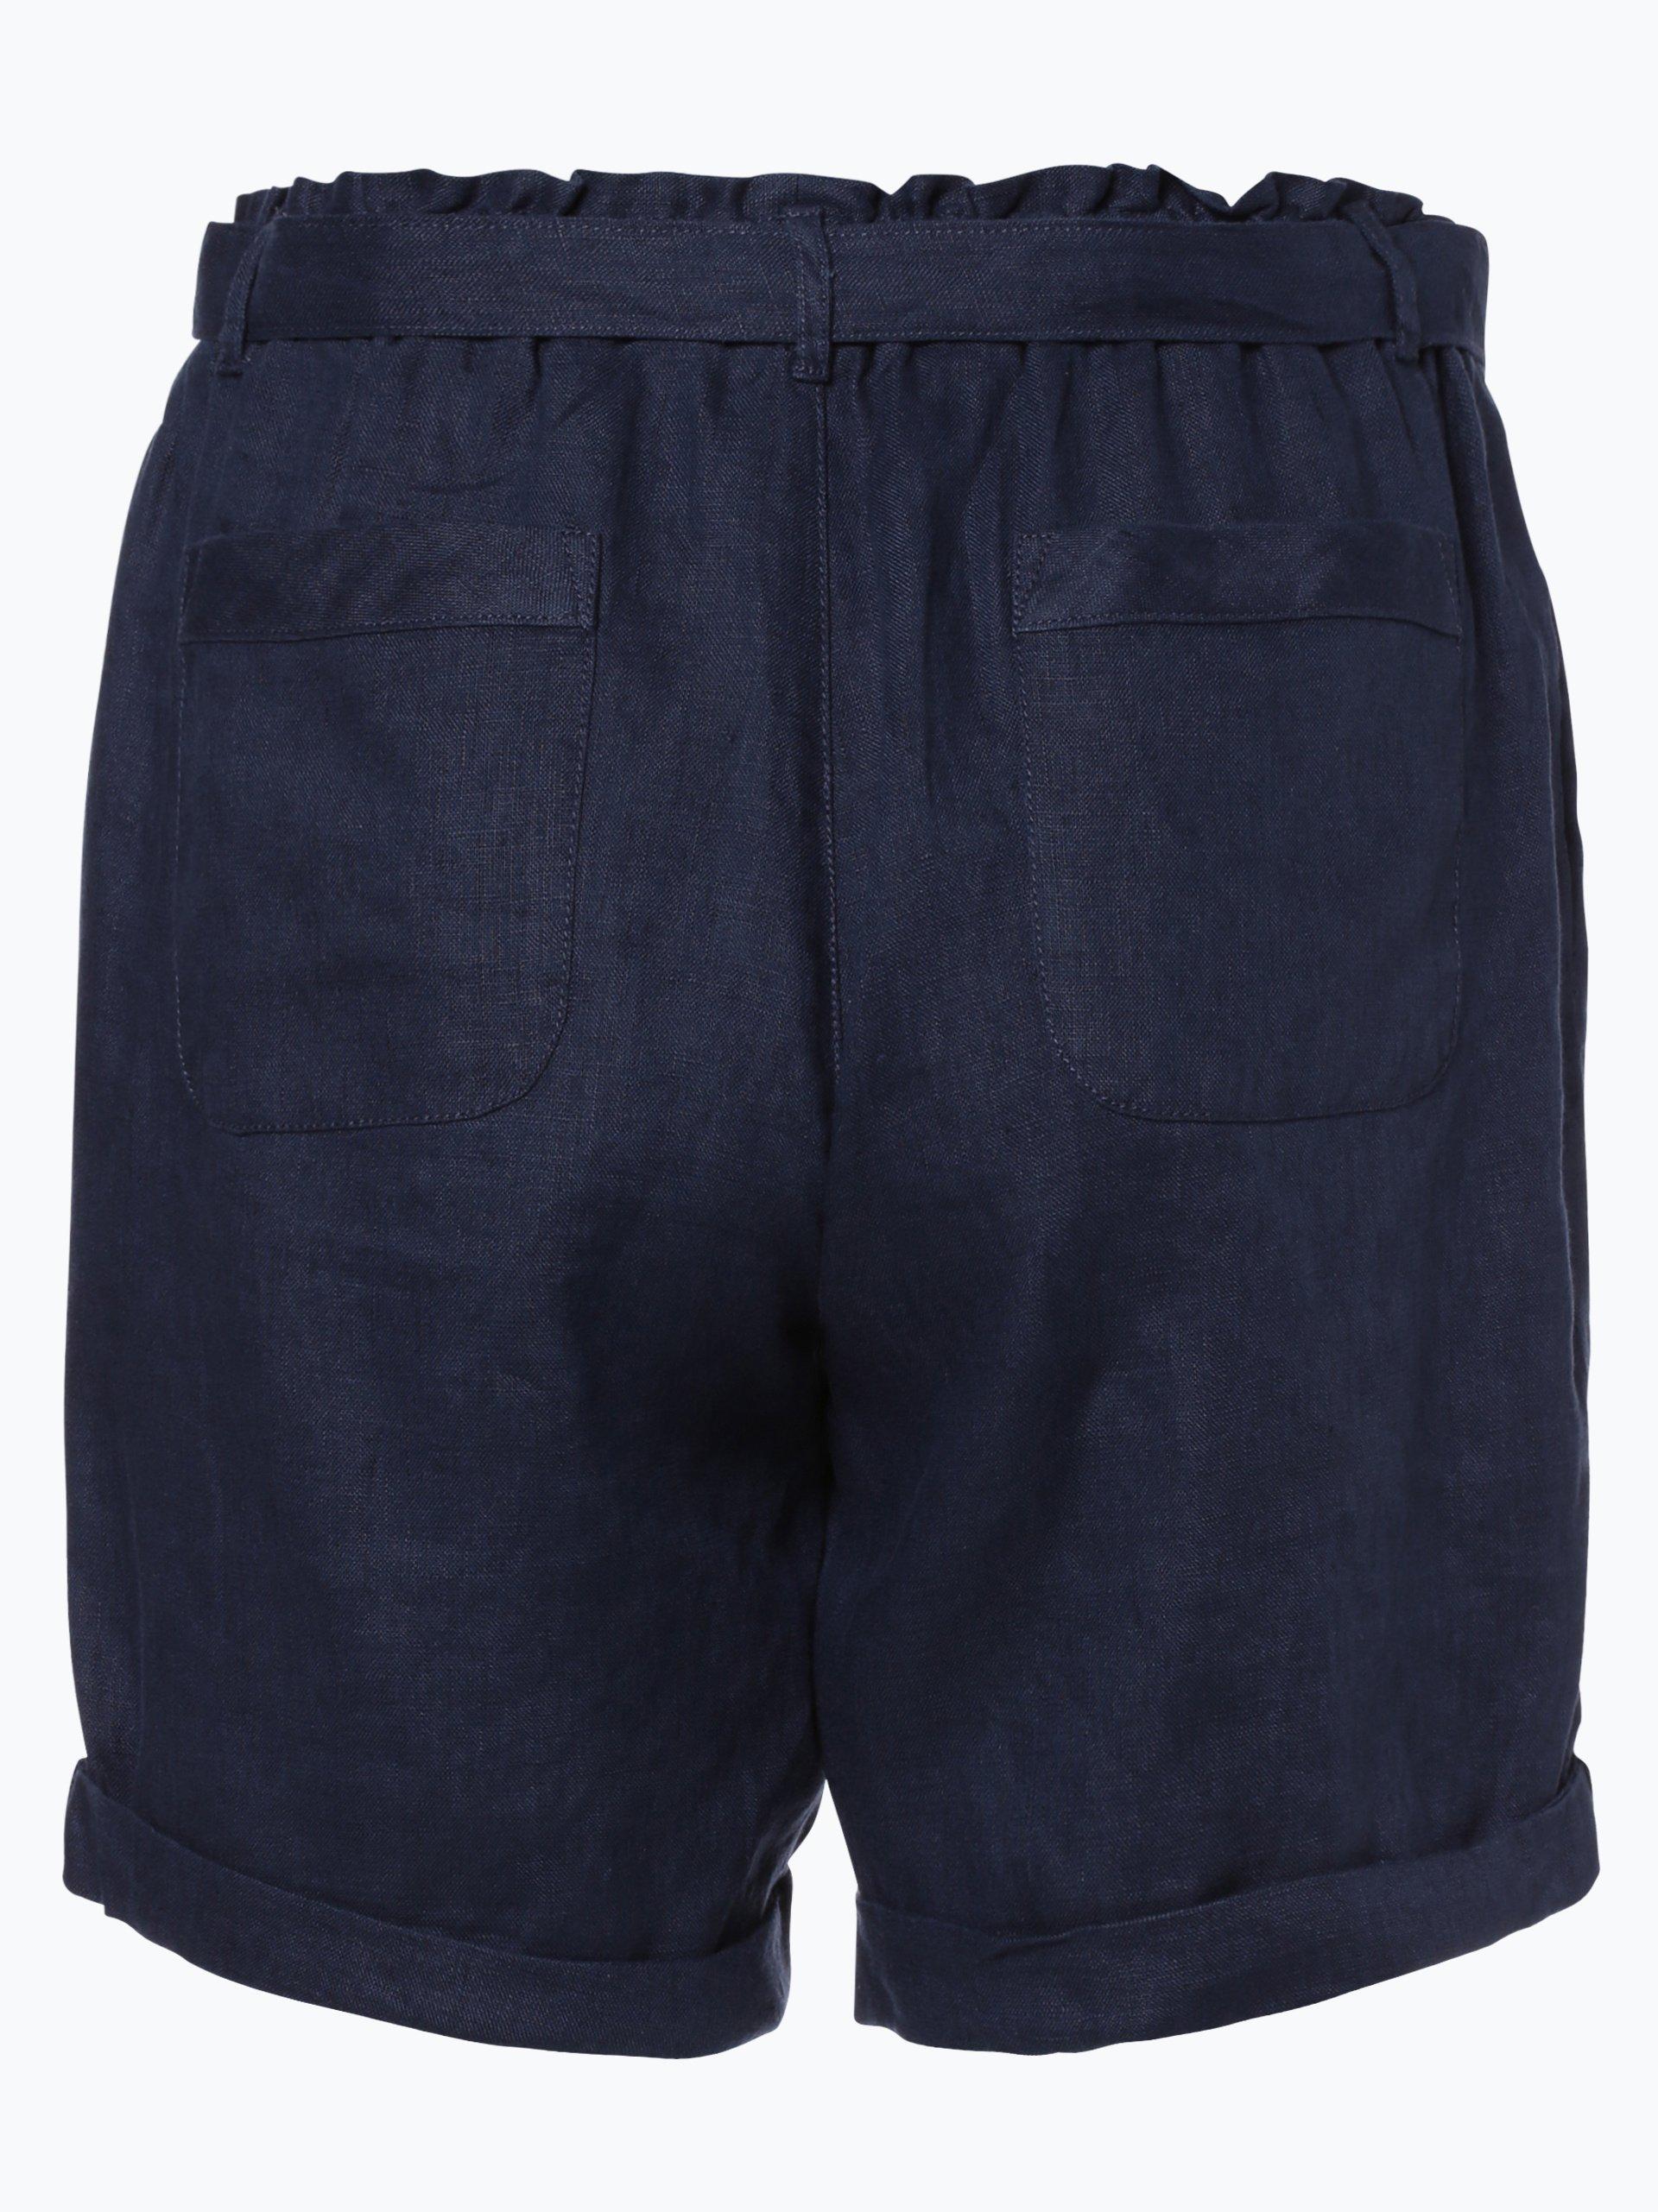 franco callegari damen shorts aus leinen marine meliert online kaufen vangraaf com. Black Bedroom Furniture Sets. Home Design Ideas